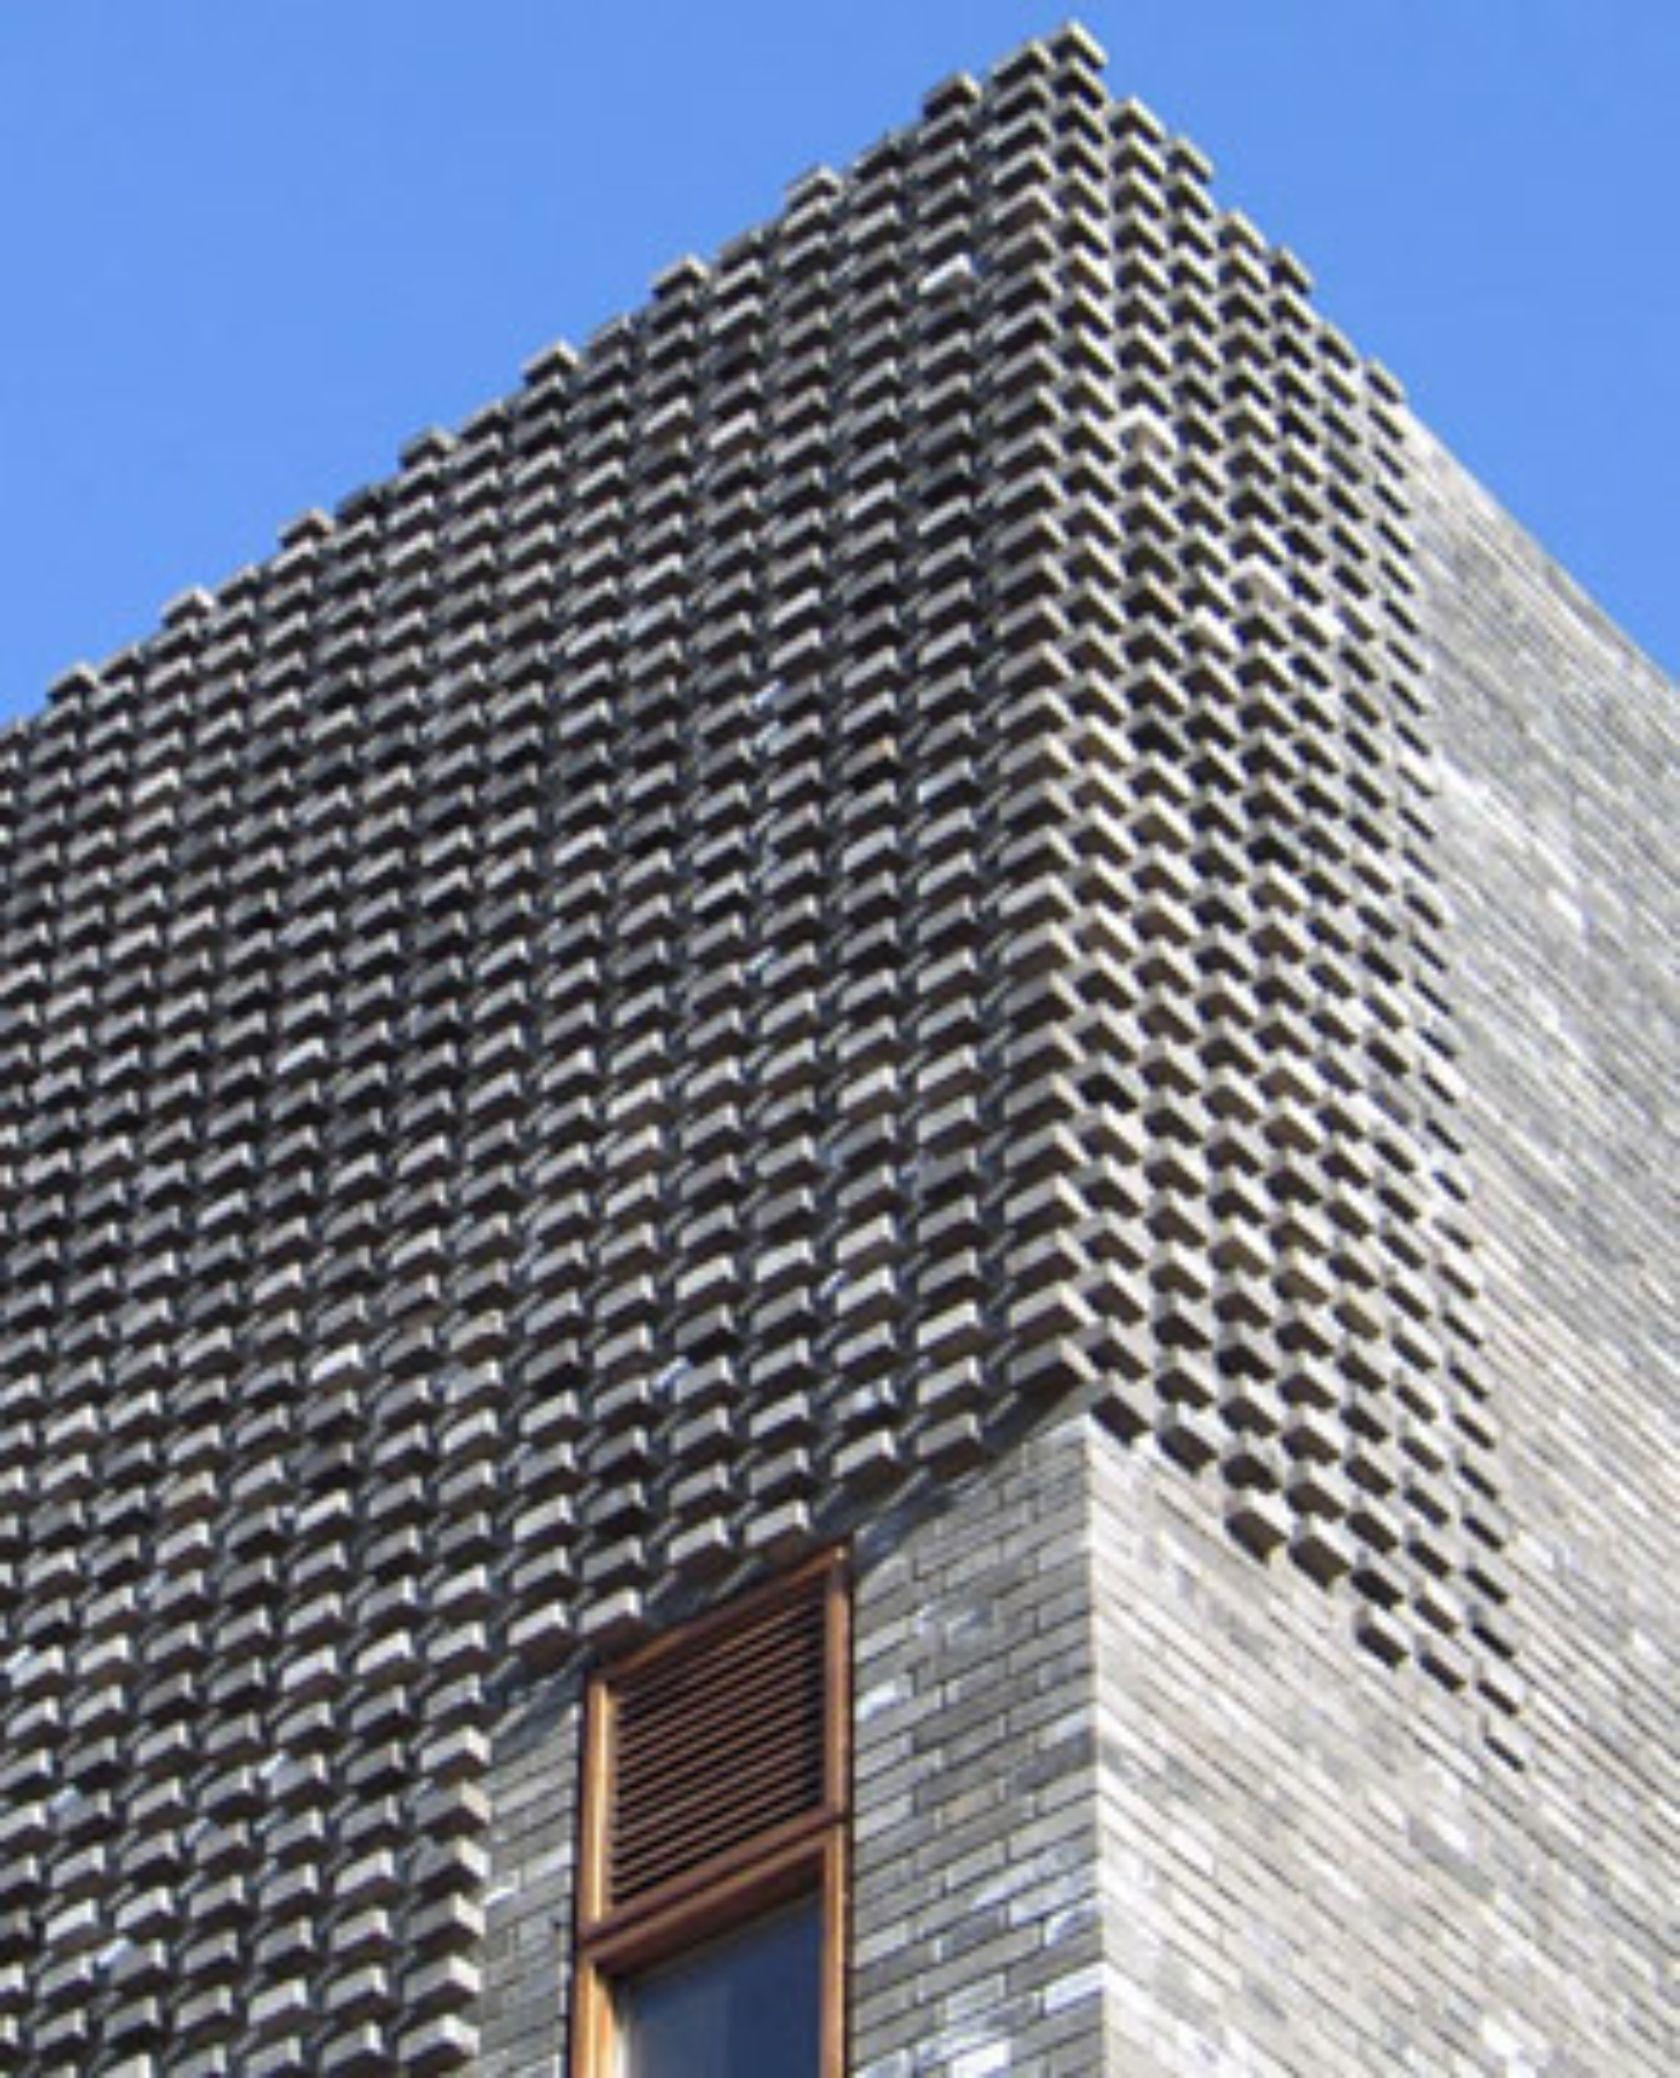 Facade Tetris The Luminous And Textured Potential Of Brick